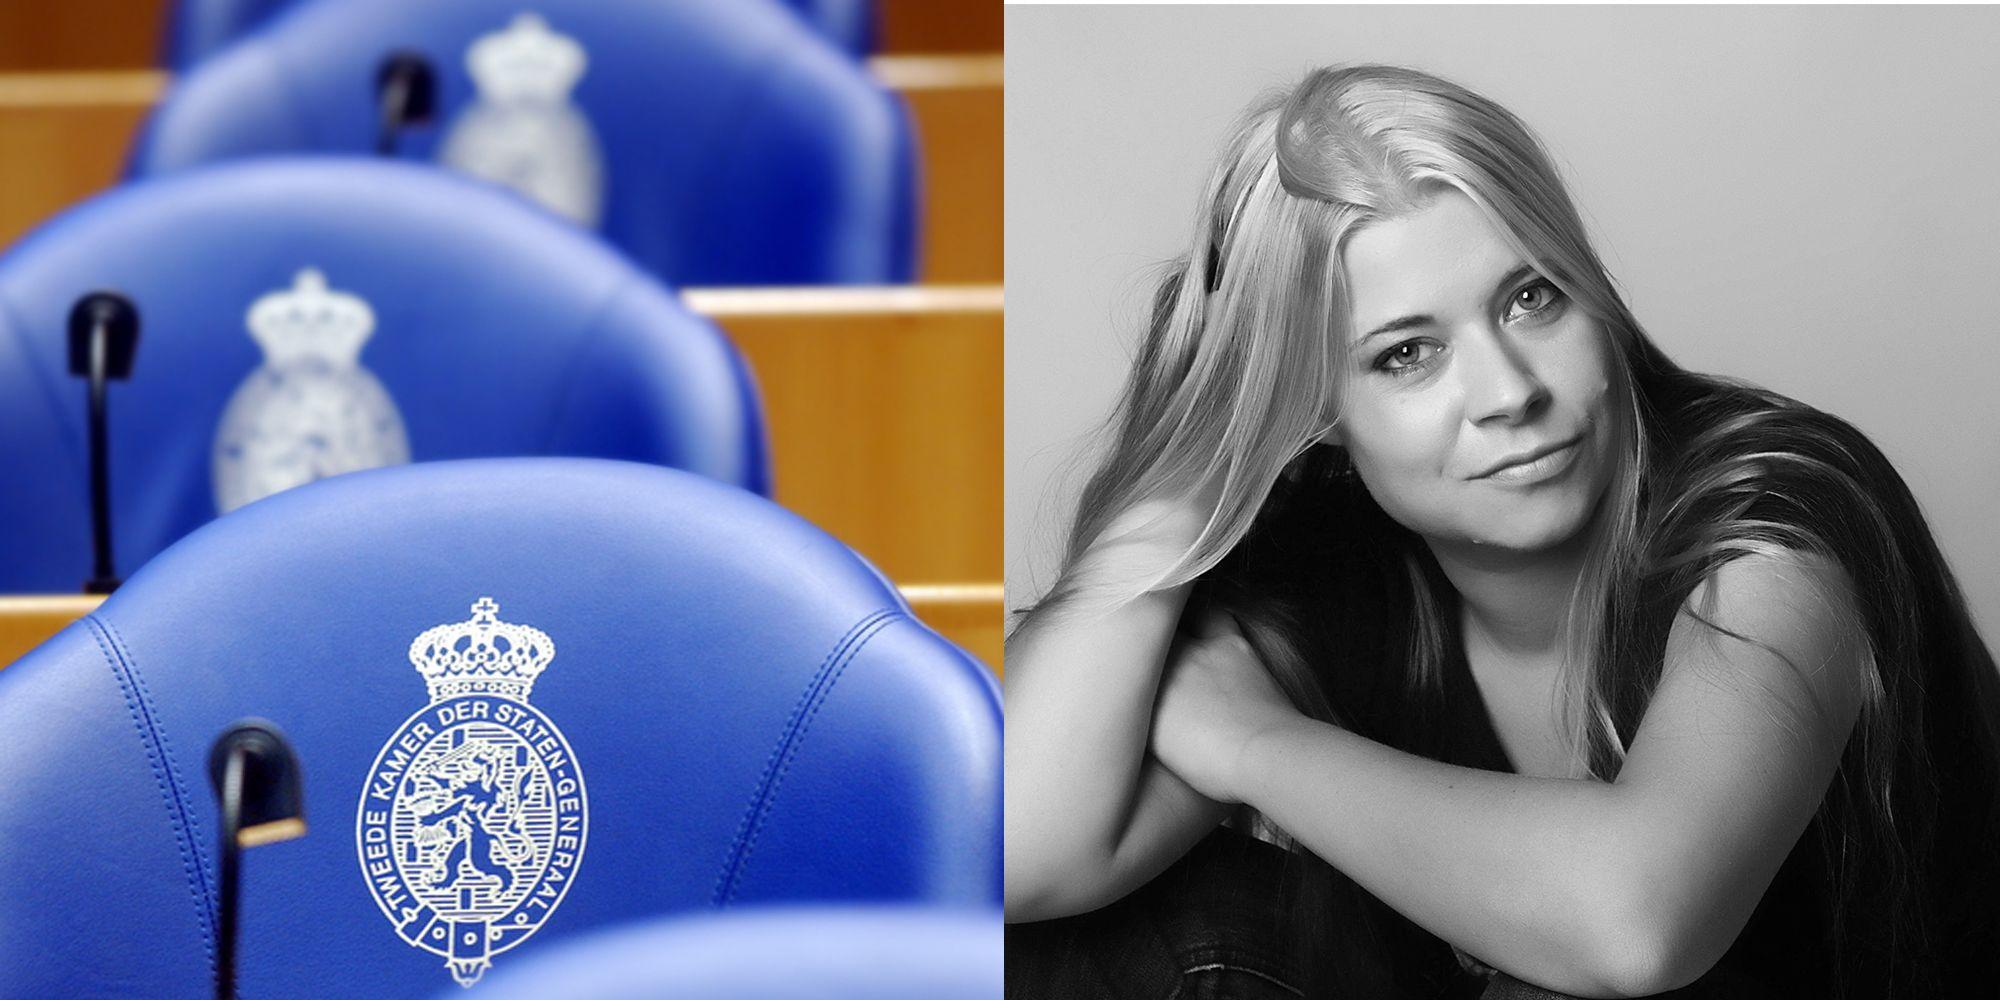 Vrouwen in de politiek - Lisa Westerveld spreekt zich uit over vrouwen in de politiek